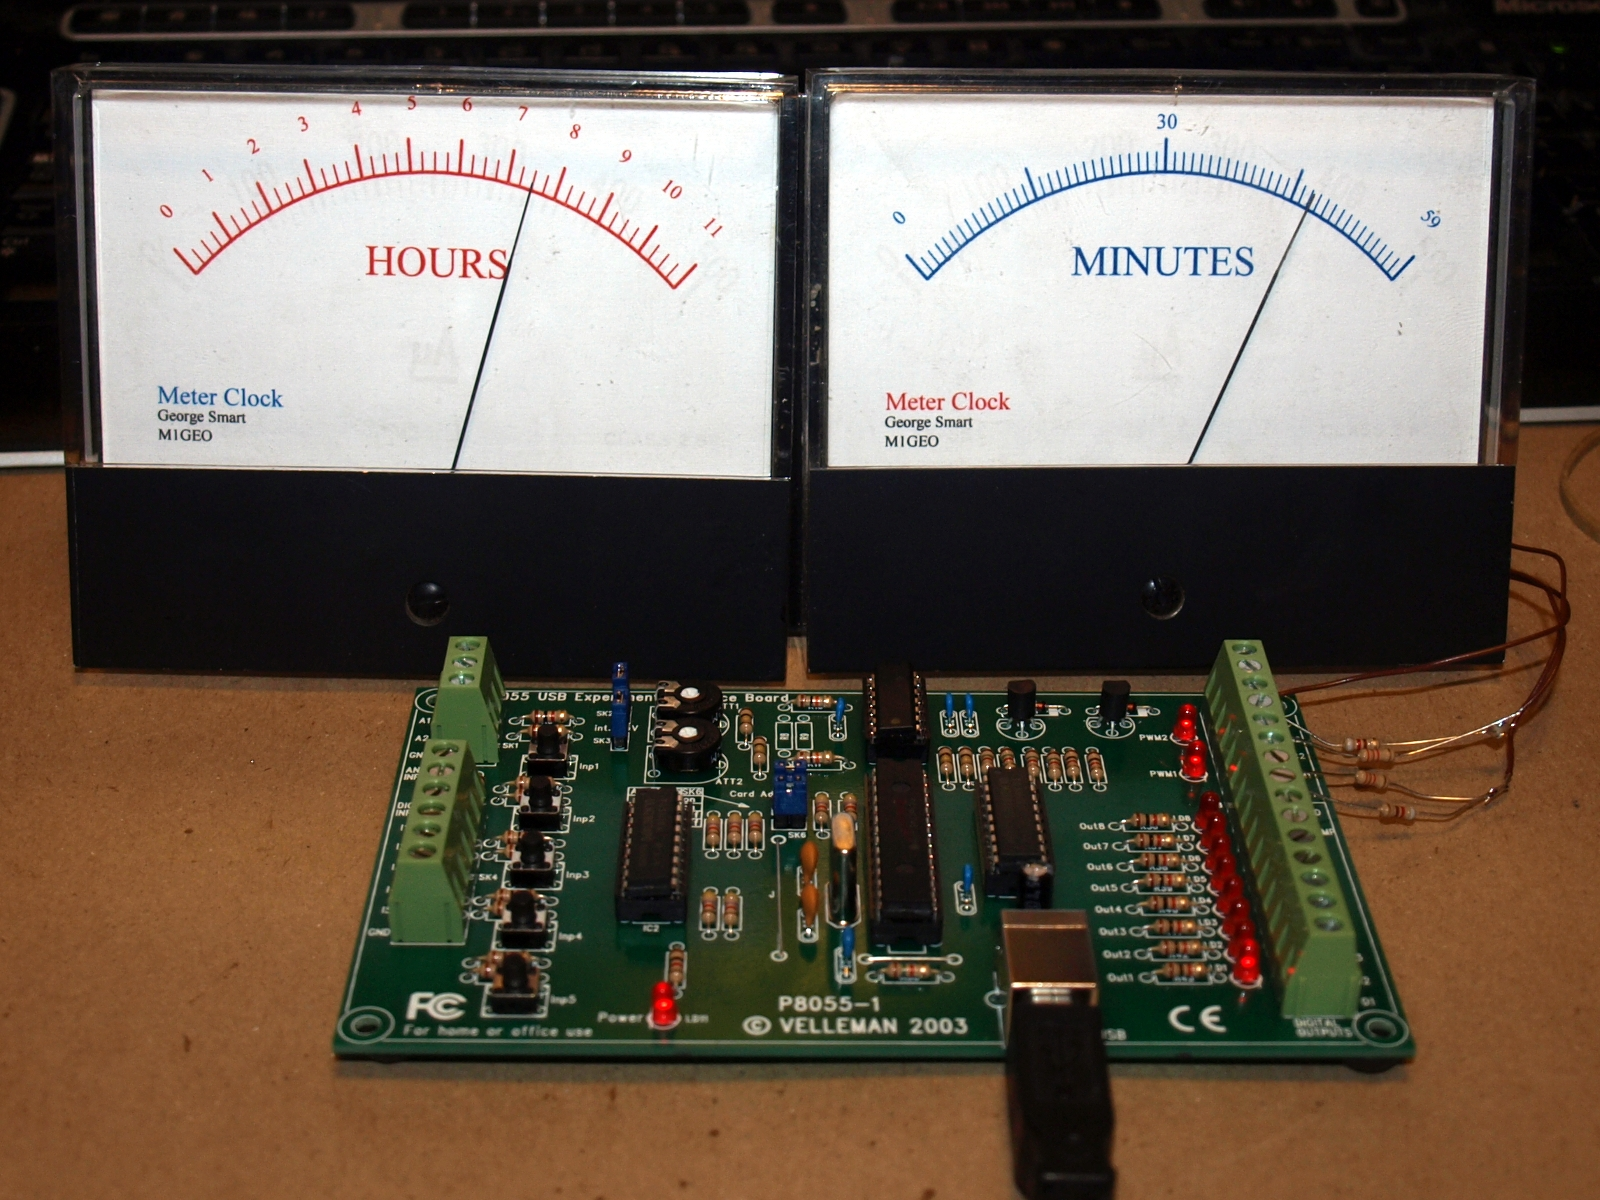 Moving Coil Meter Clock